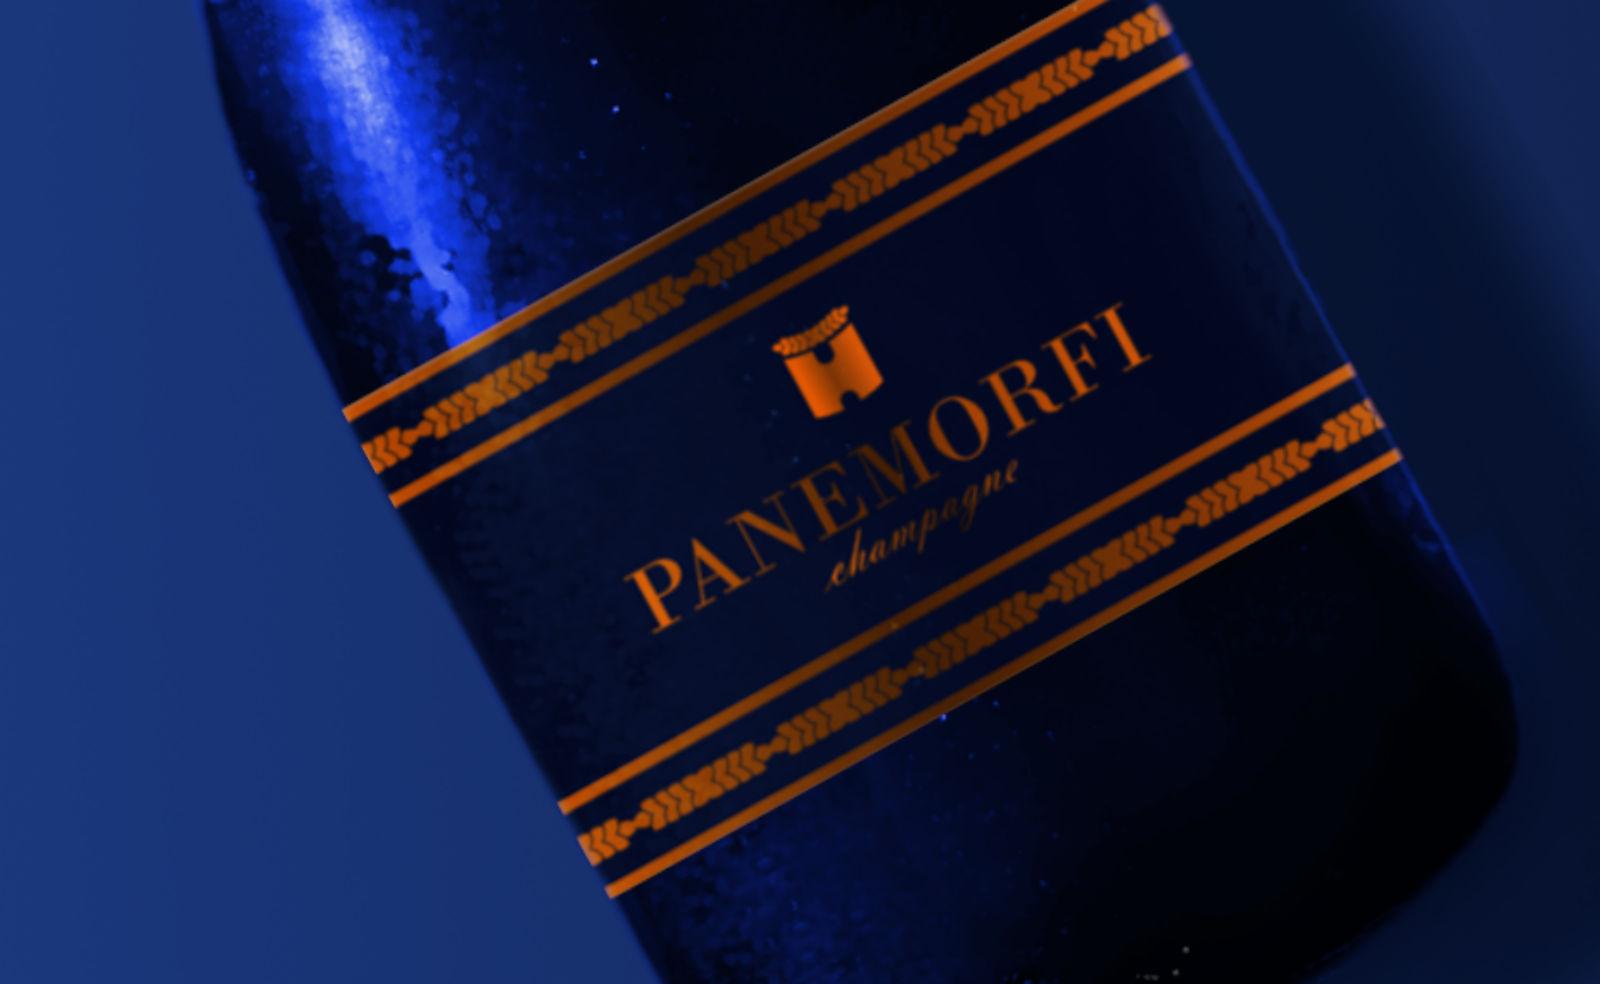 panemorfi_champagne_wine_mockup-_close_view